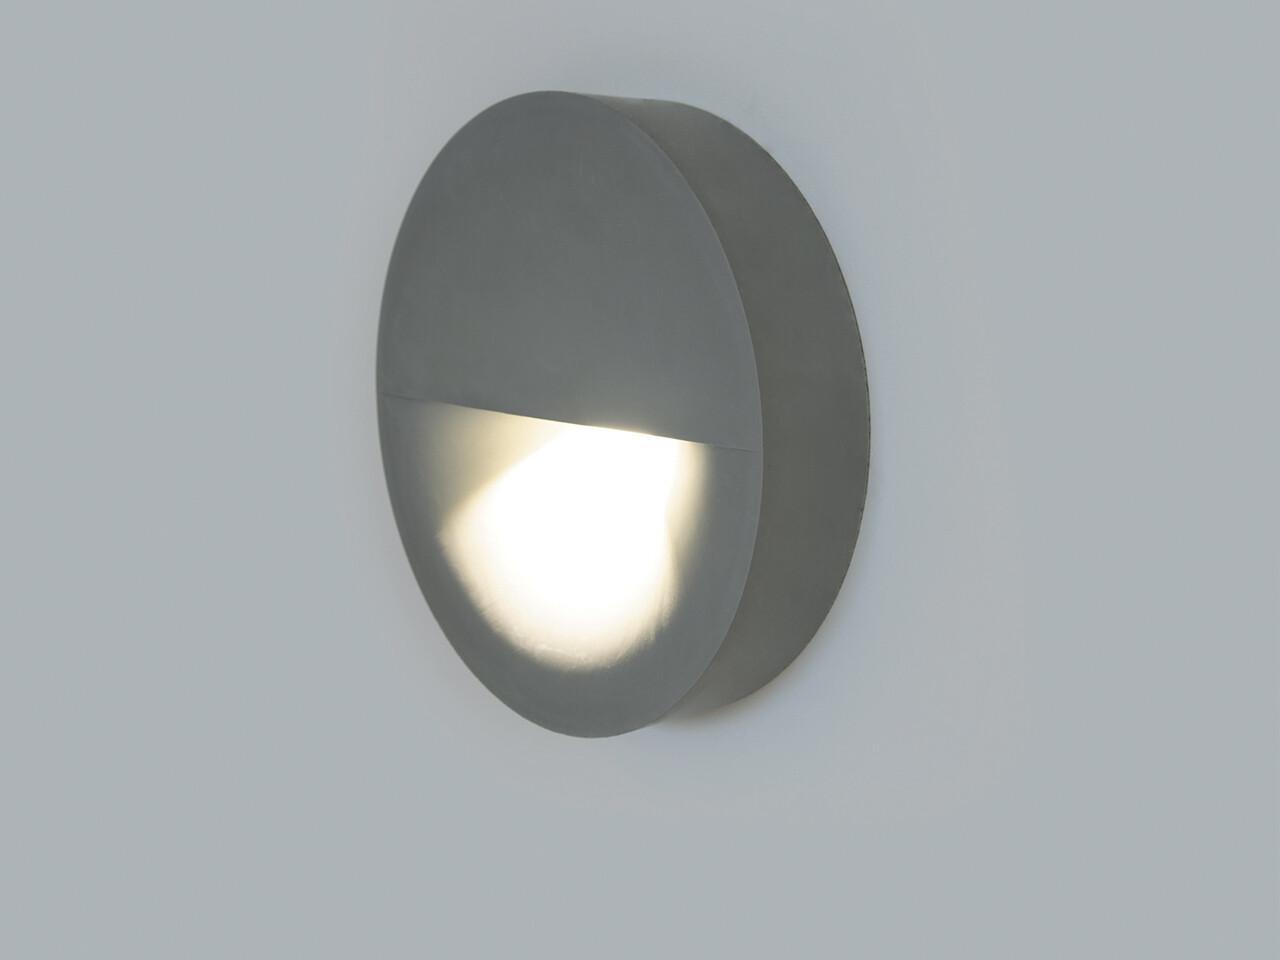 9010 Wandleuchte LEVICO LED 10W, IP65, Corten